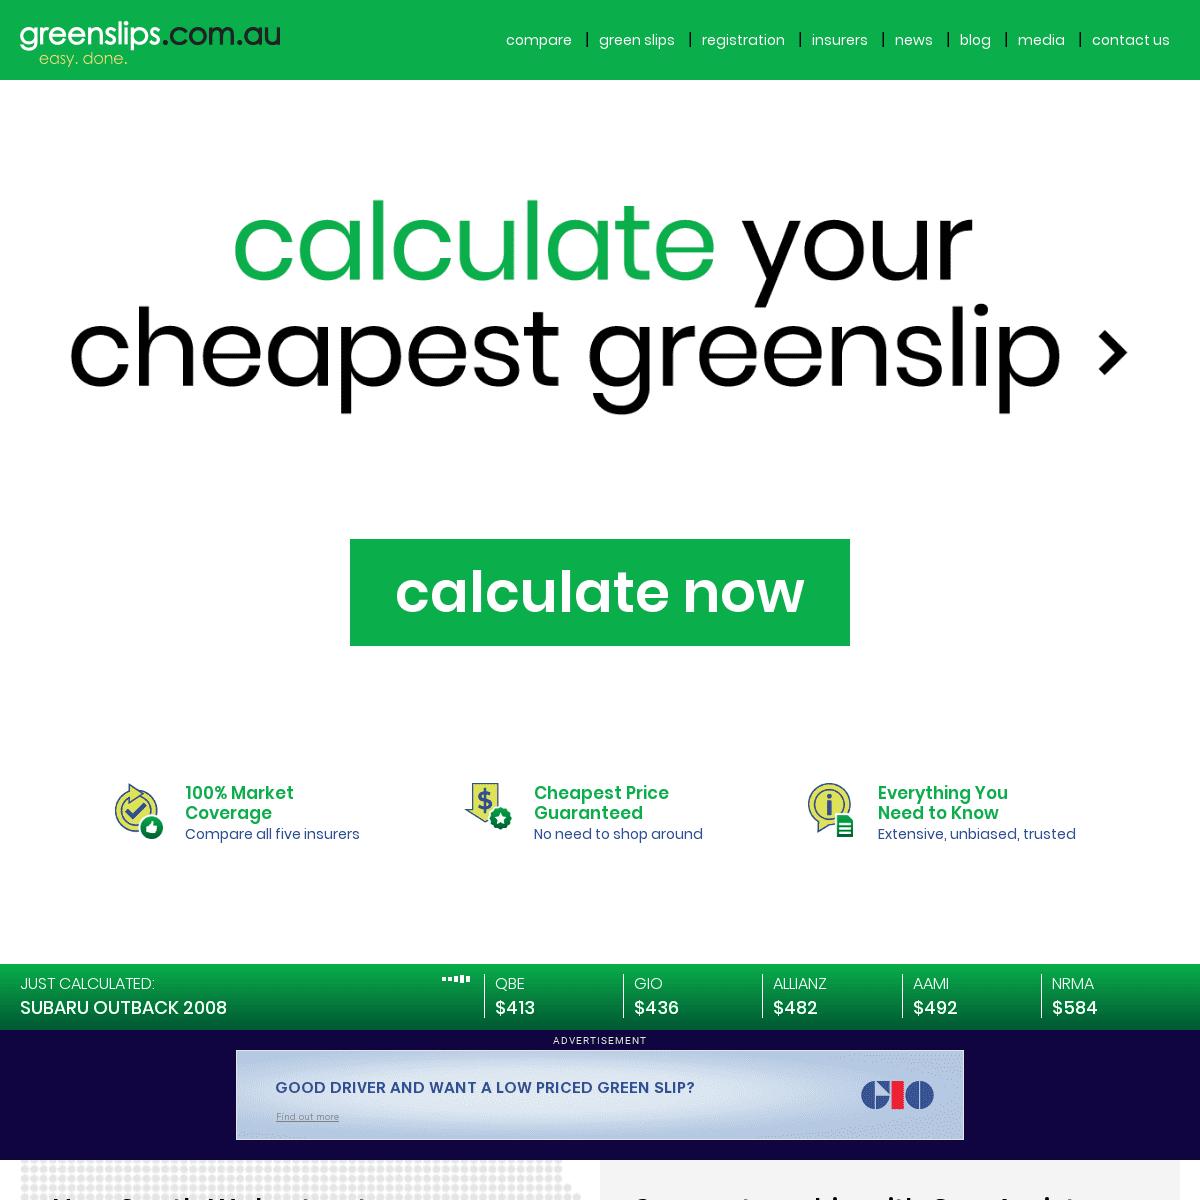 Green Slip NSW - Greenslip - CTP Insurance - greenslips.com.au